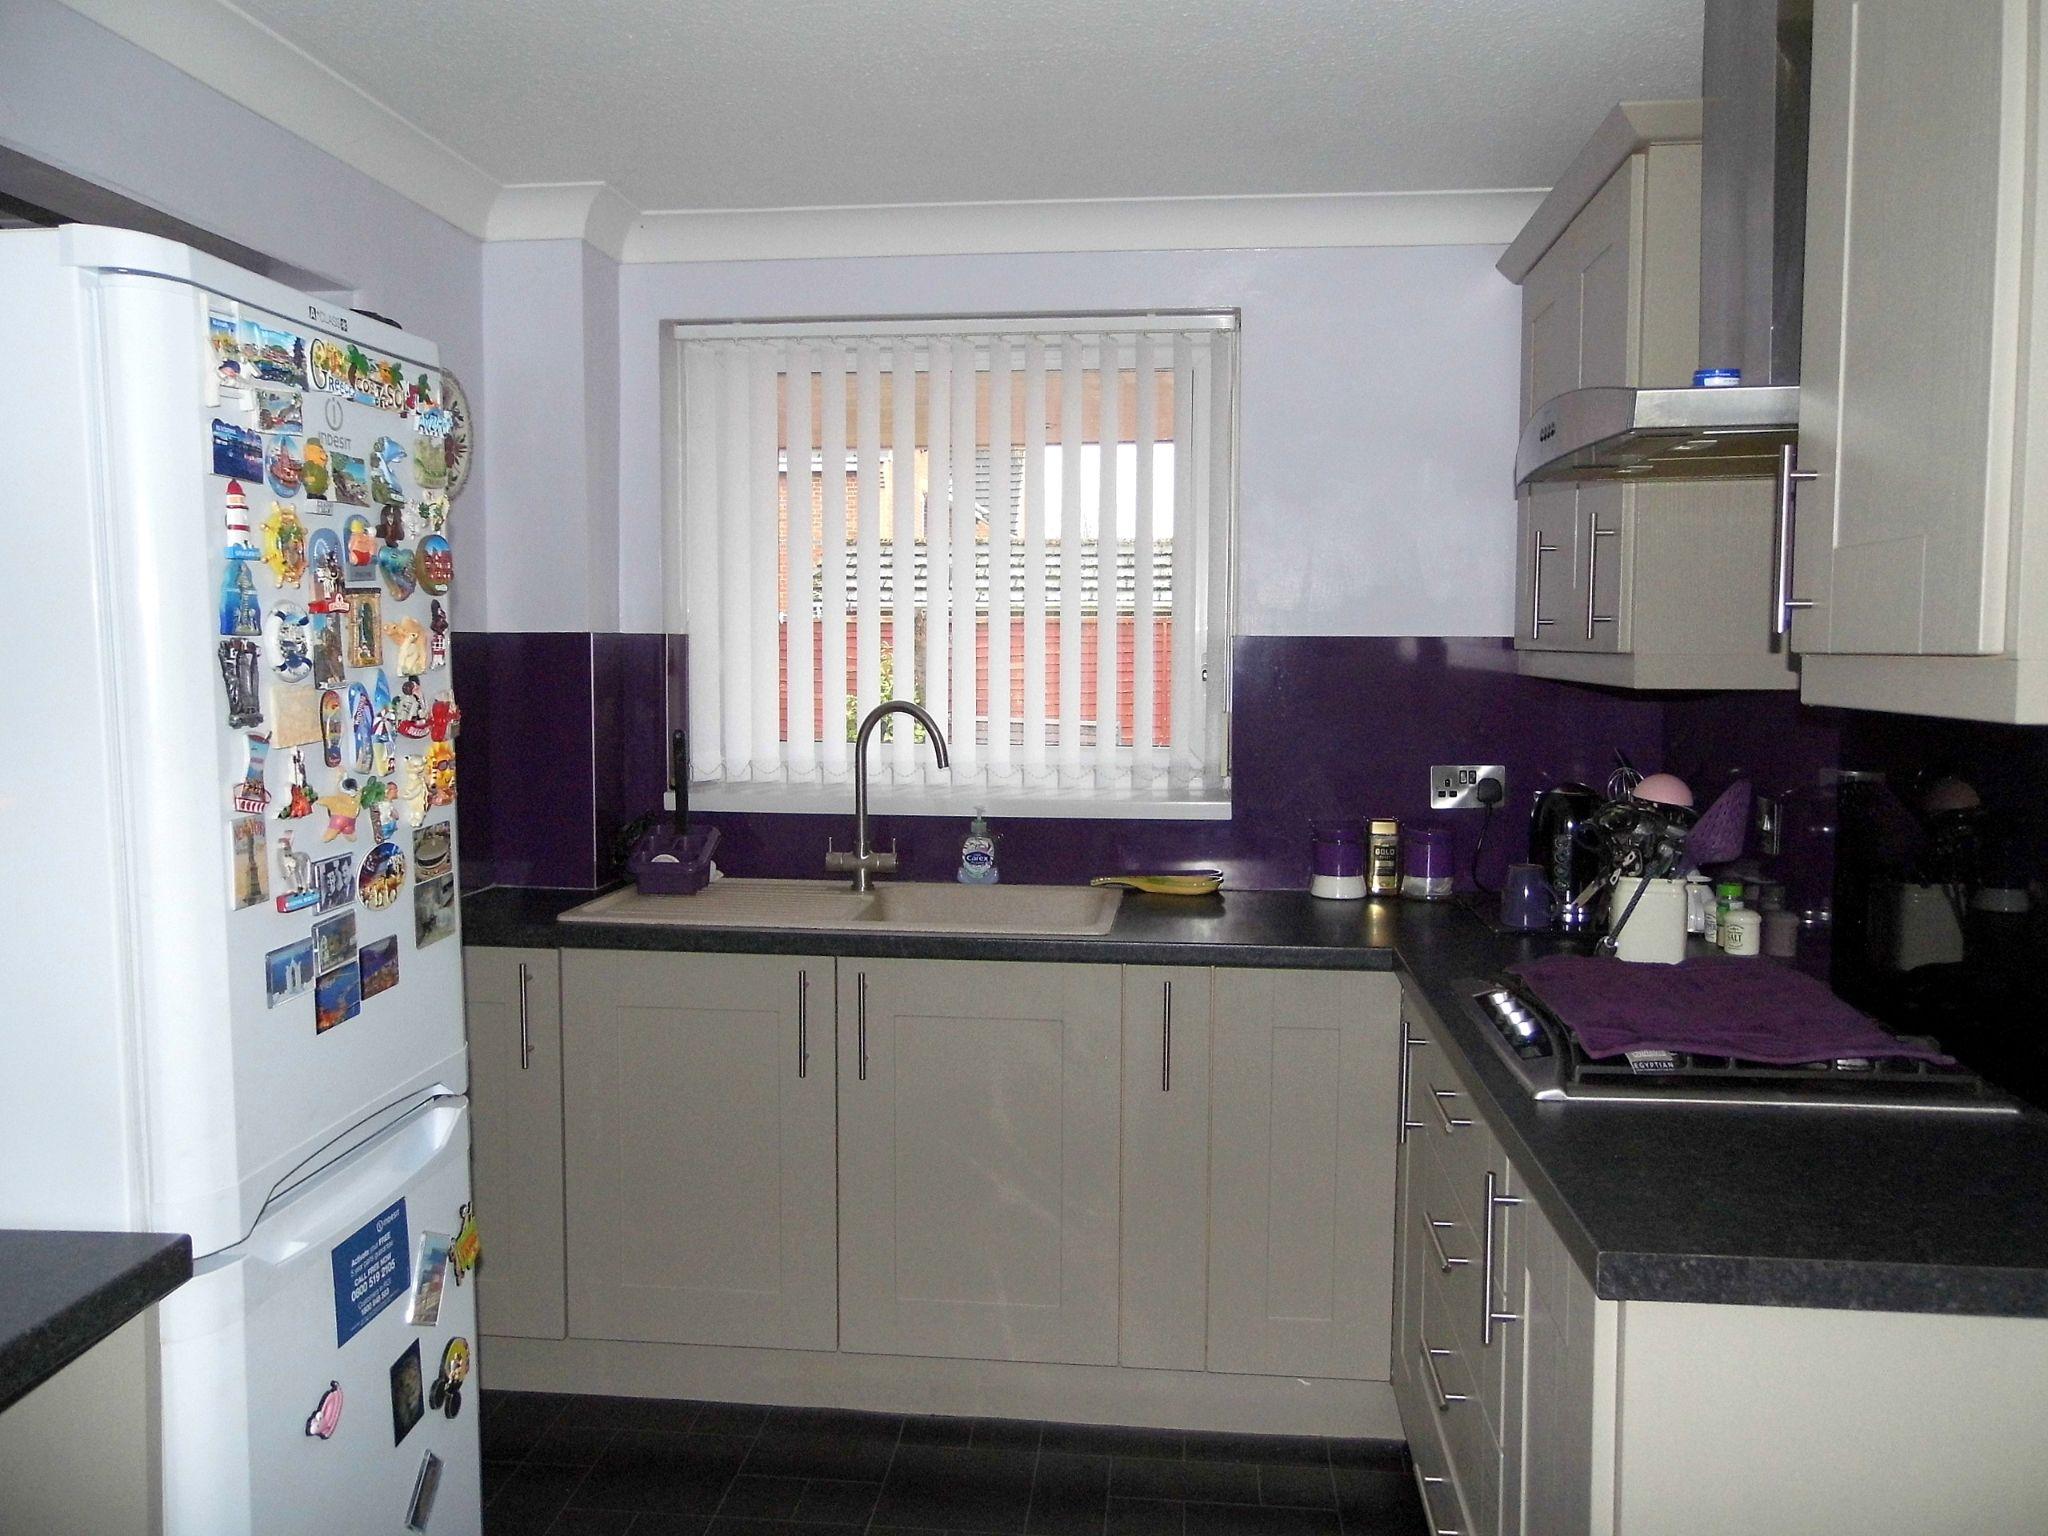 4 bedroom detached house SSTC in Bishop Auckland - Kitchen.